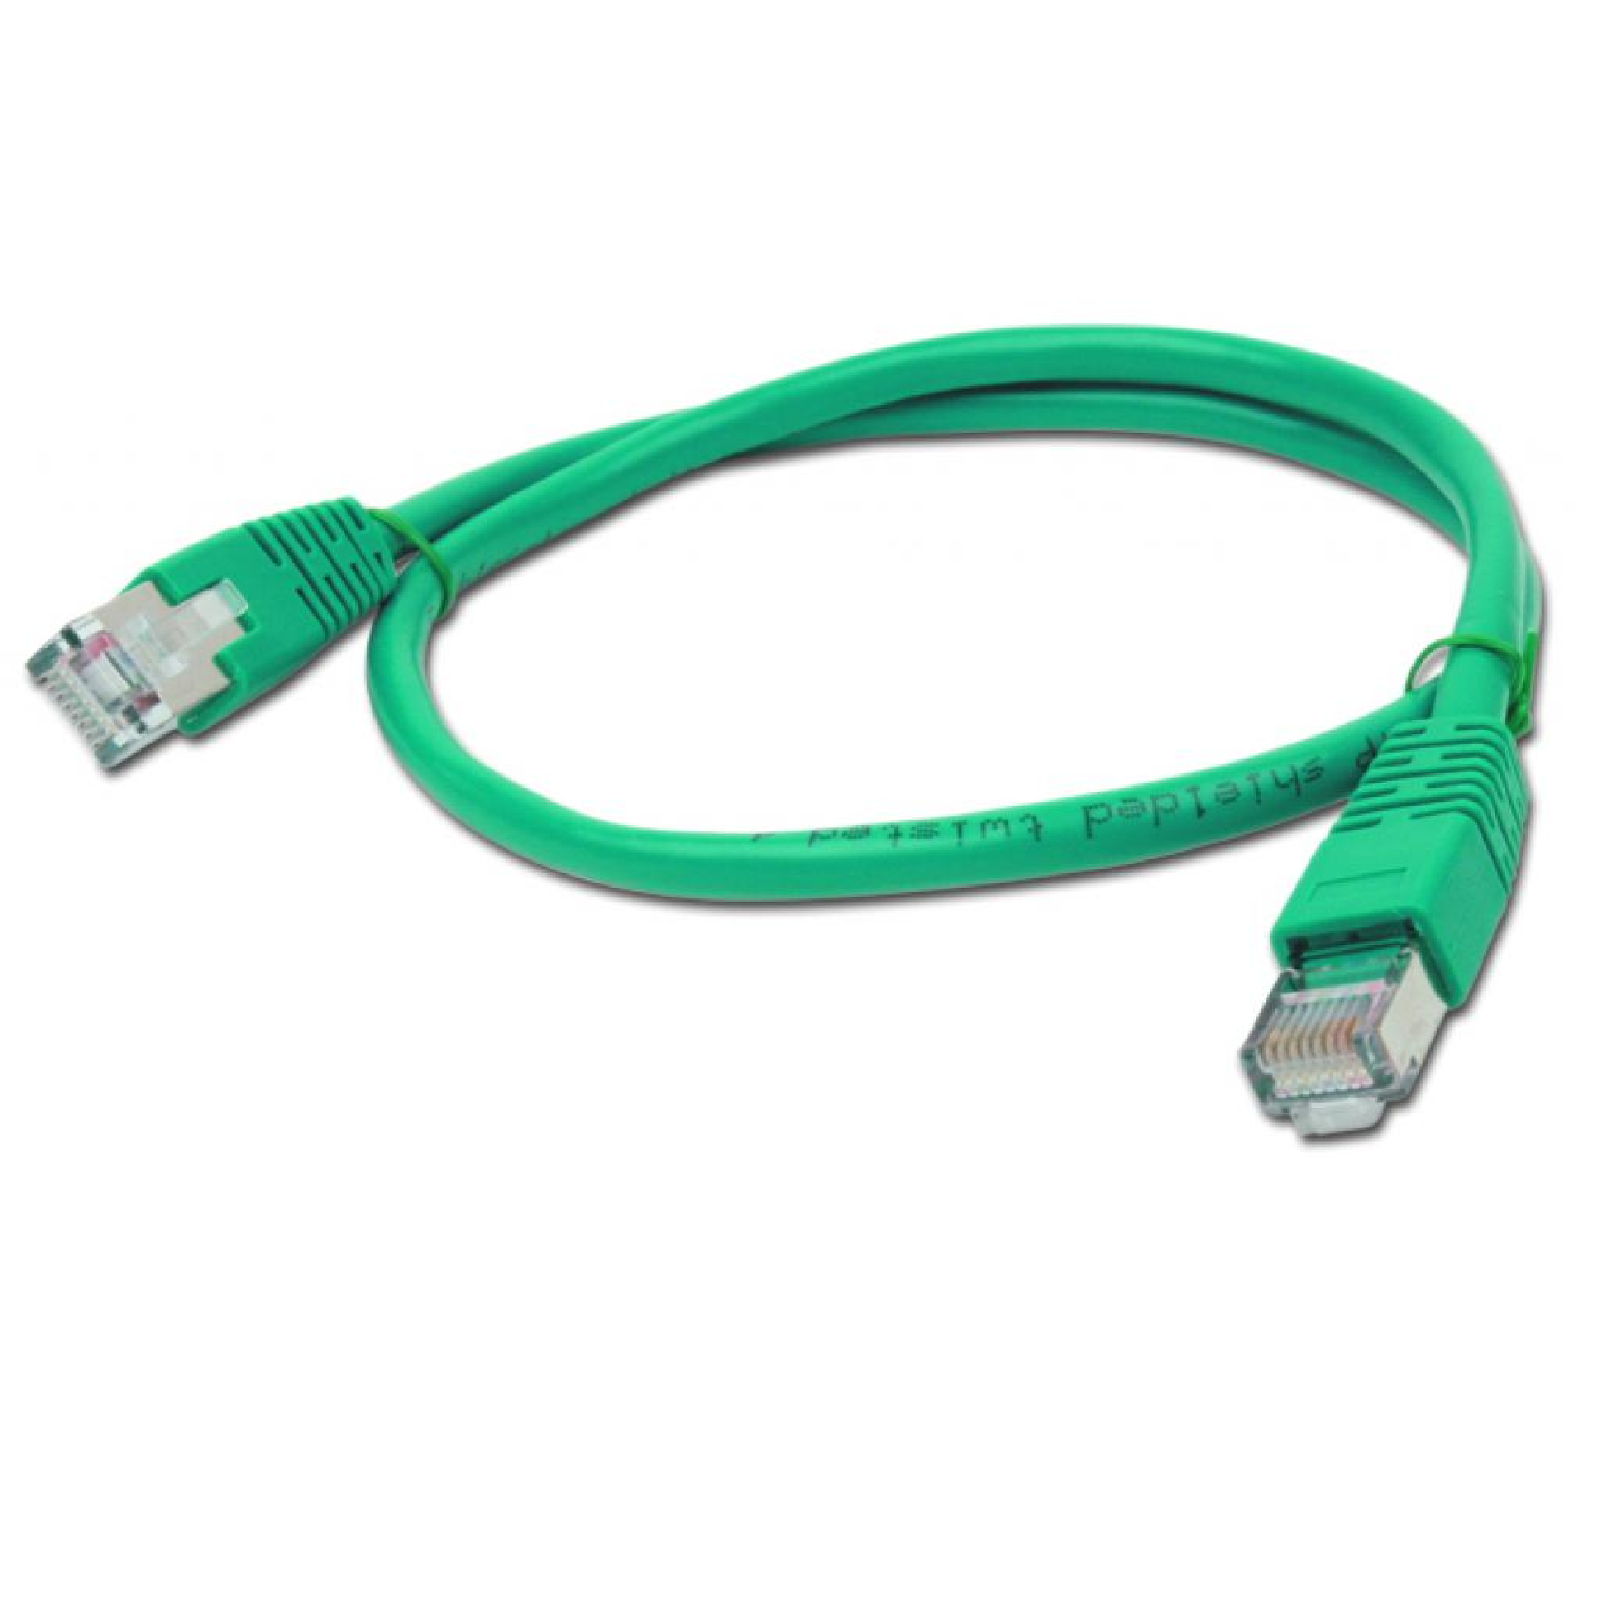 Патч-корд Cablexpert 2м (PP22-2M/G)